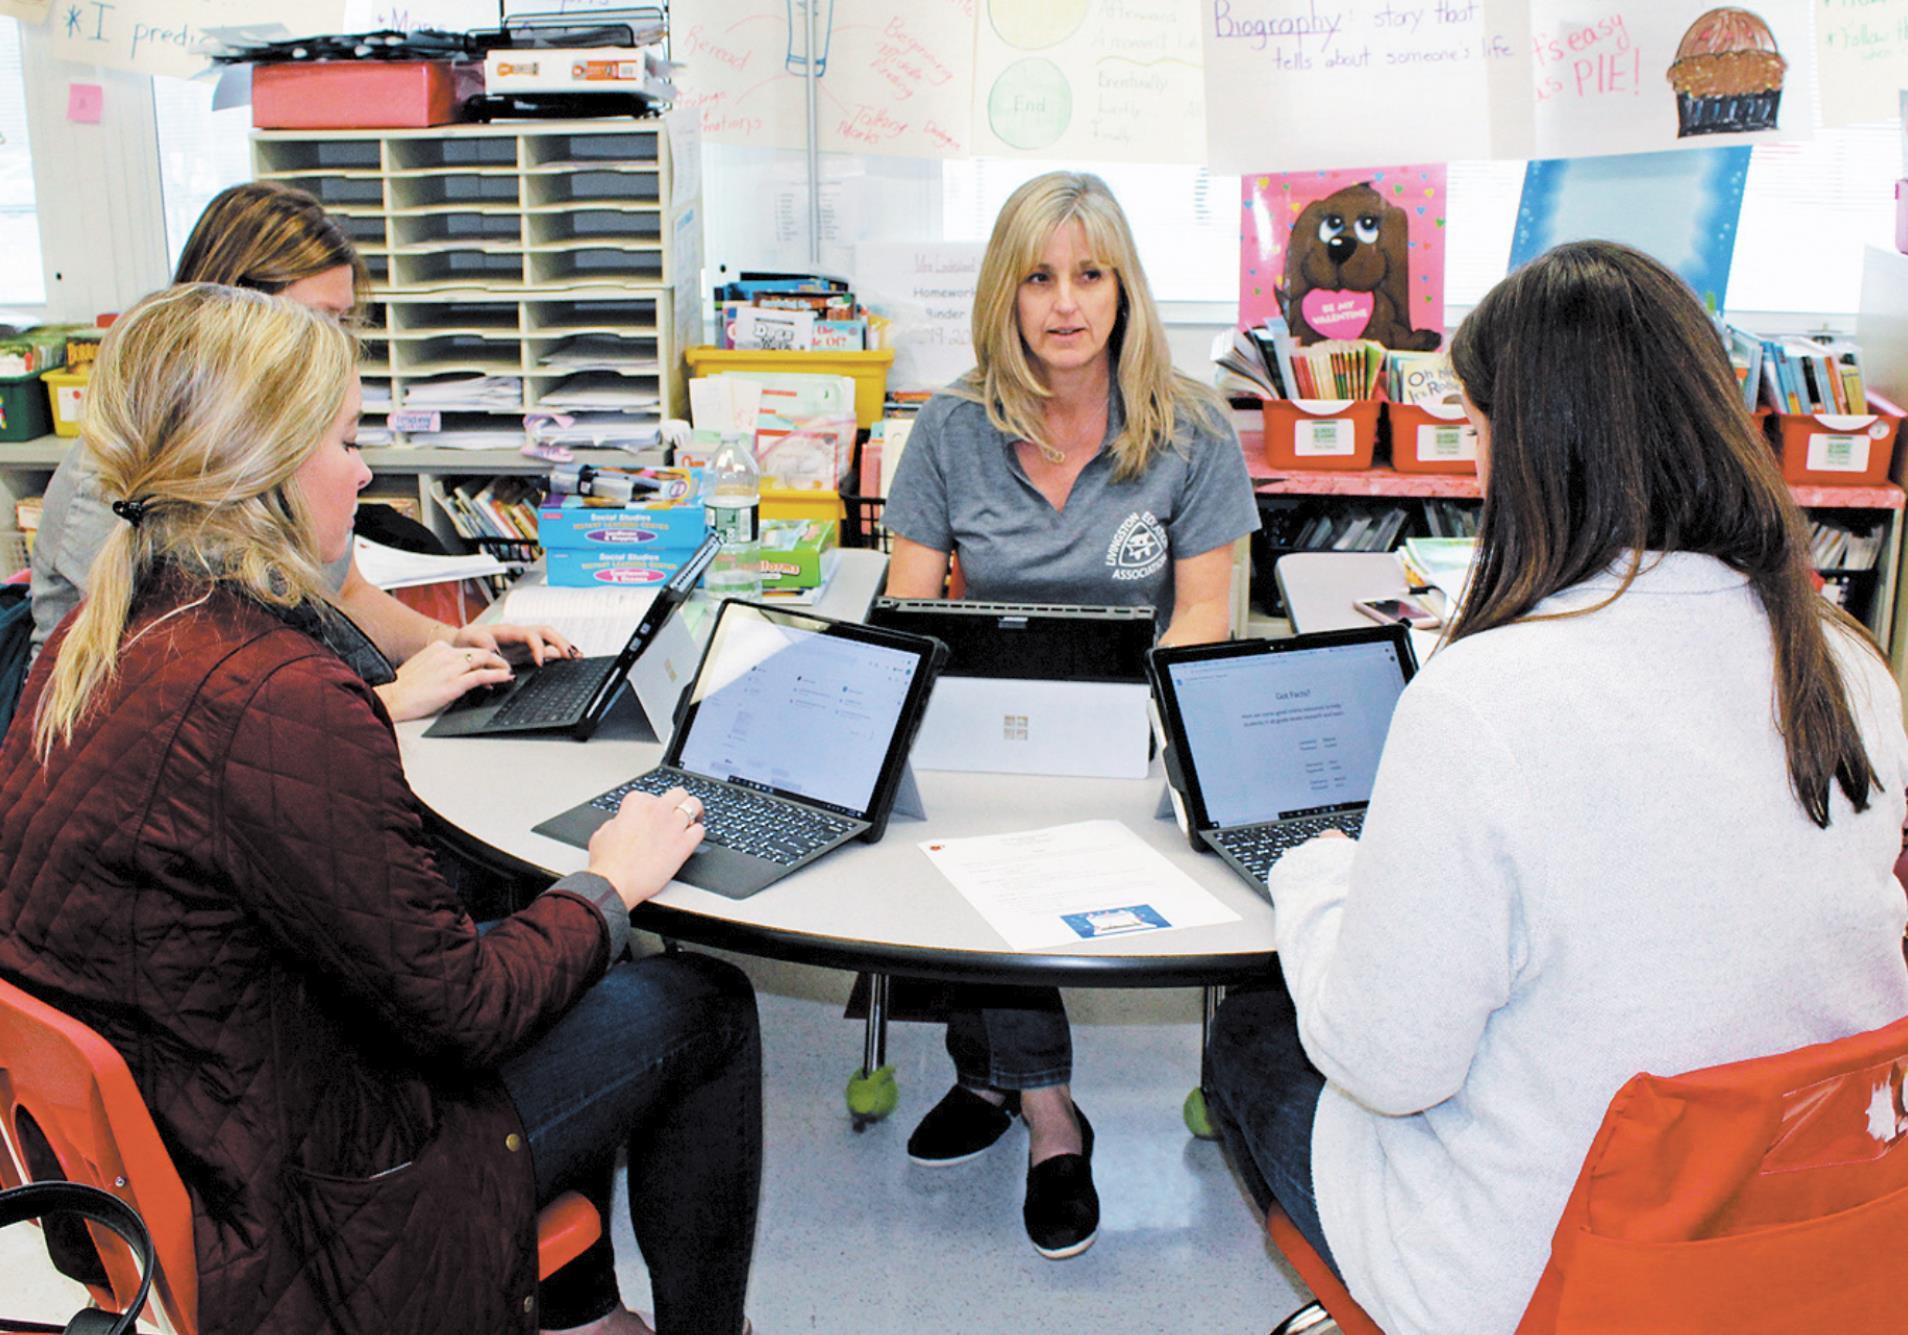 Schools Closed Tuesday for Coronavirus Prep